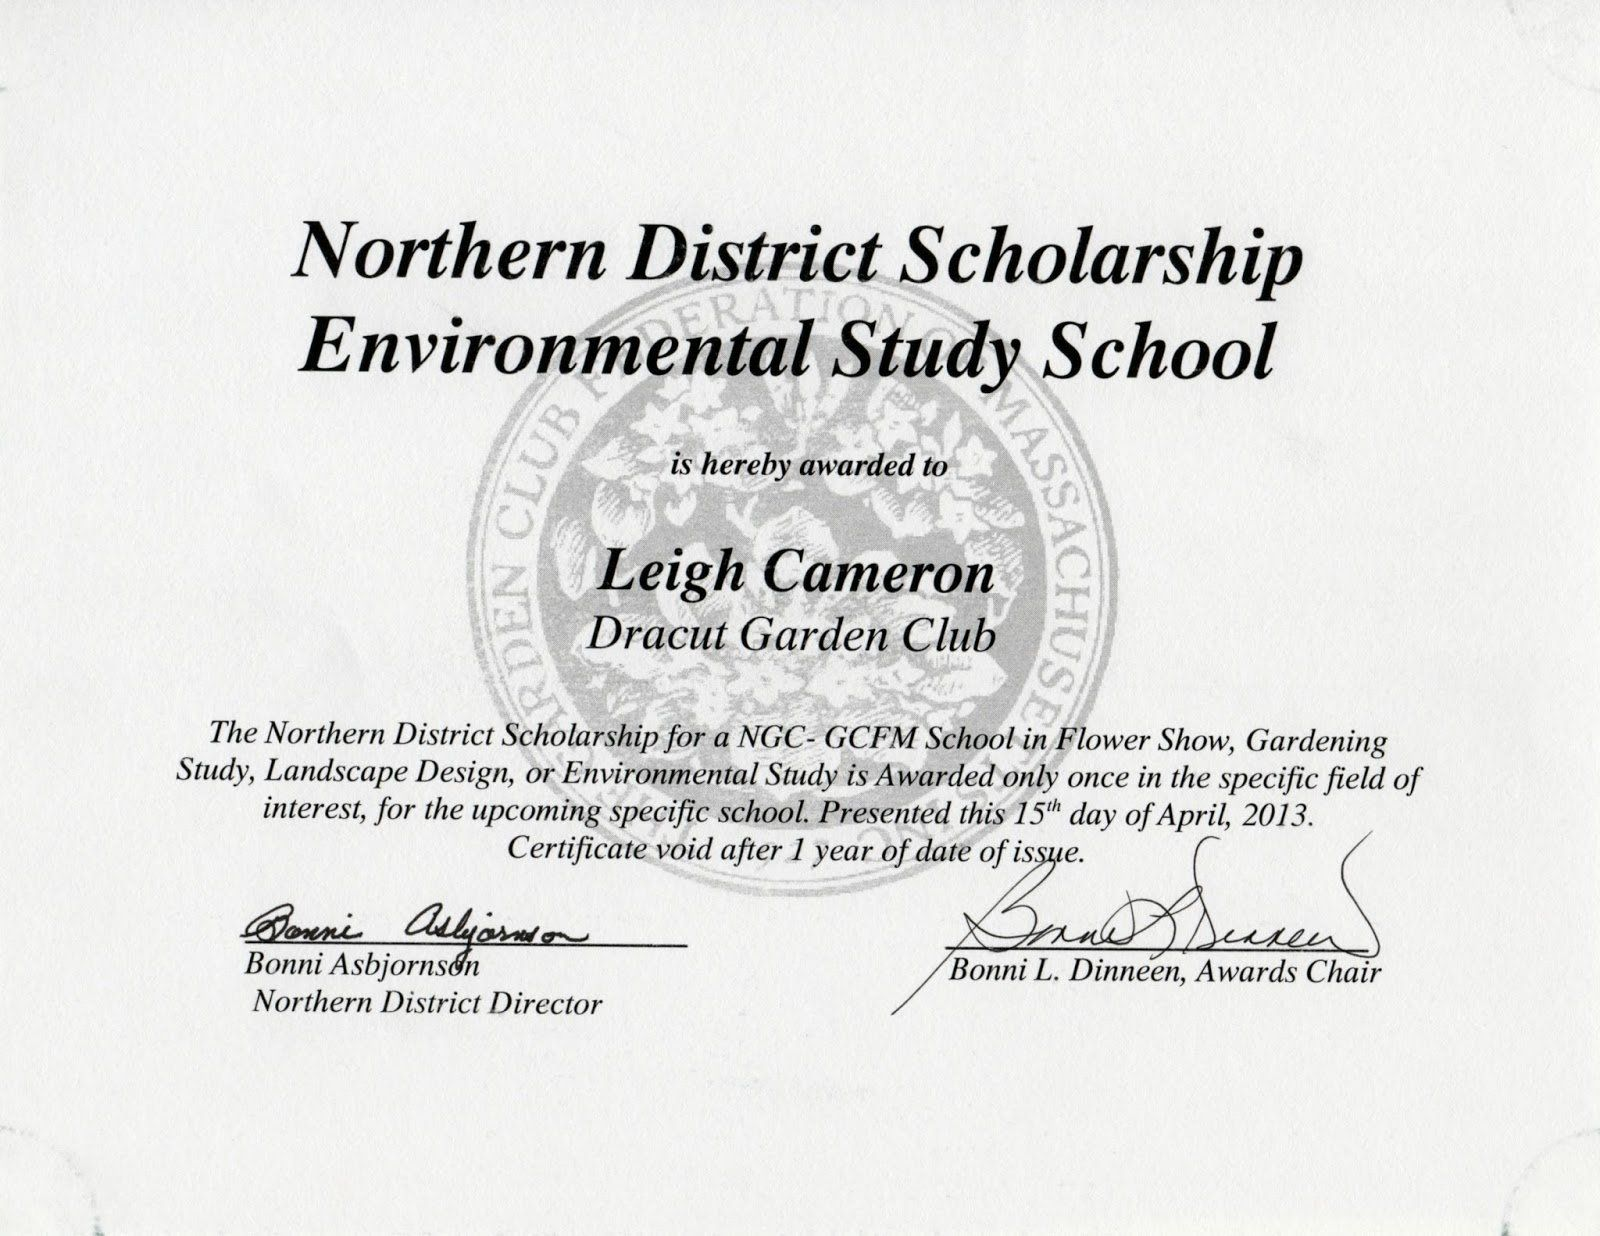 Formats for Scholarship Certificates Fresh Dracut Garden